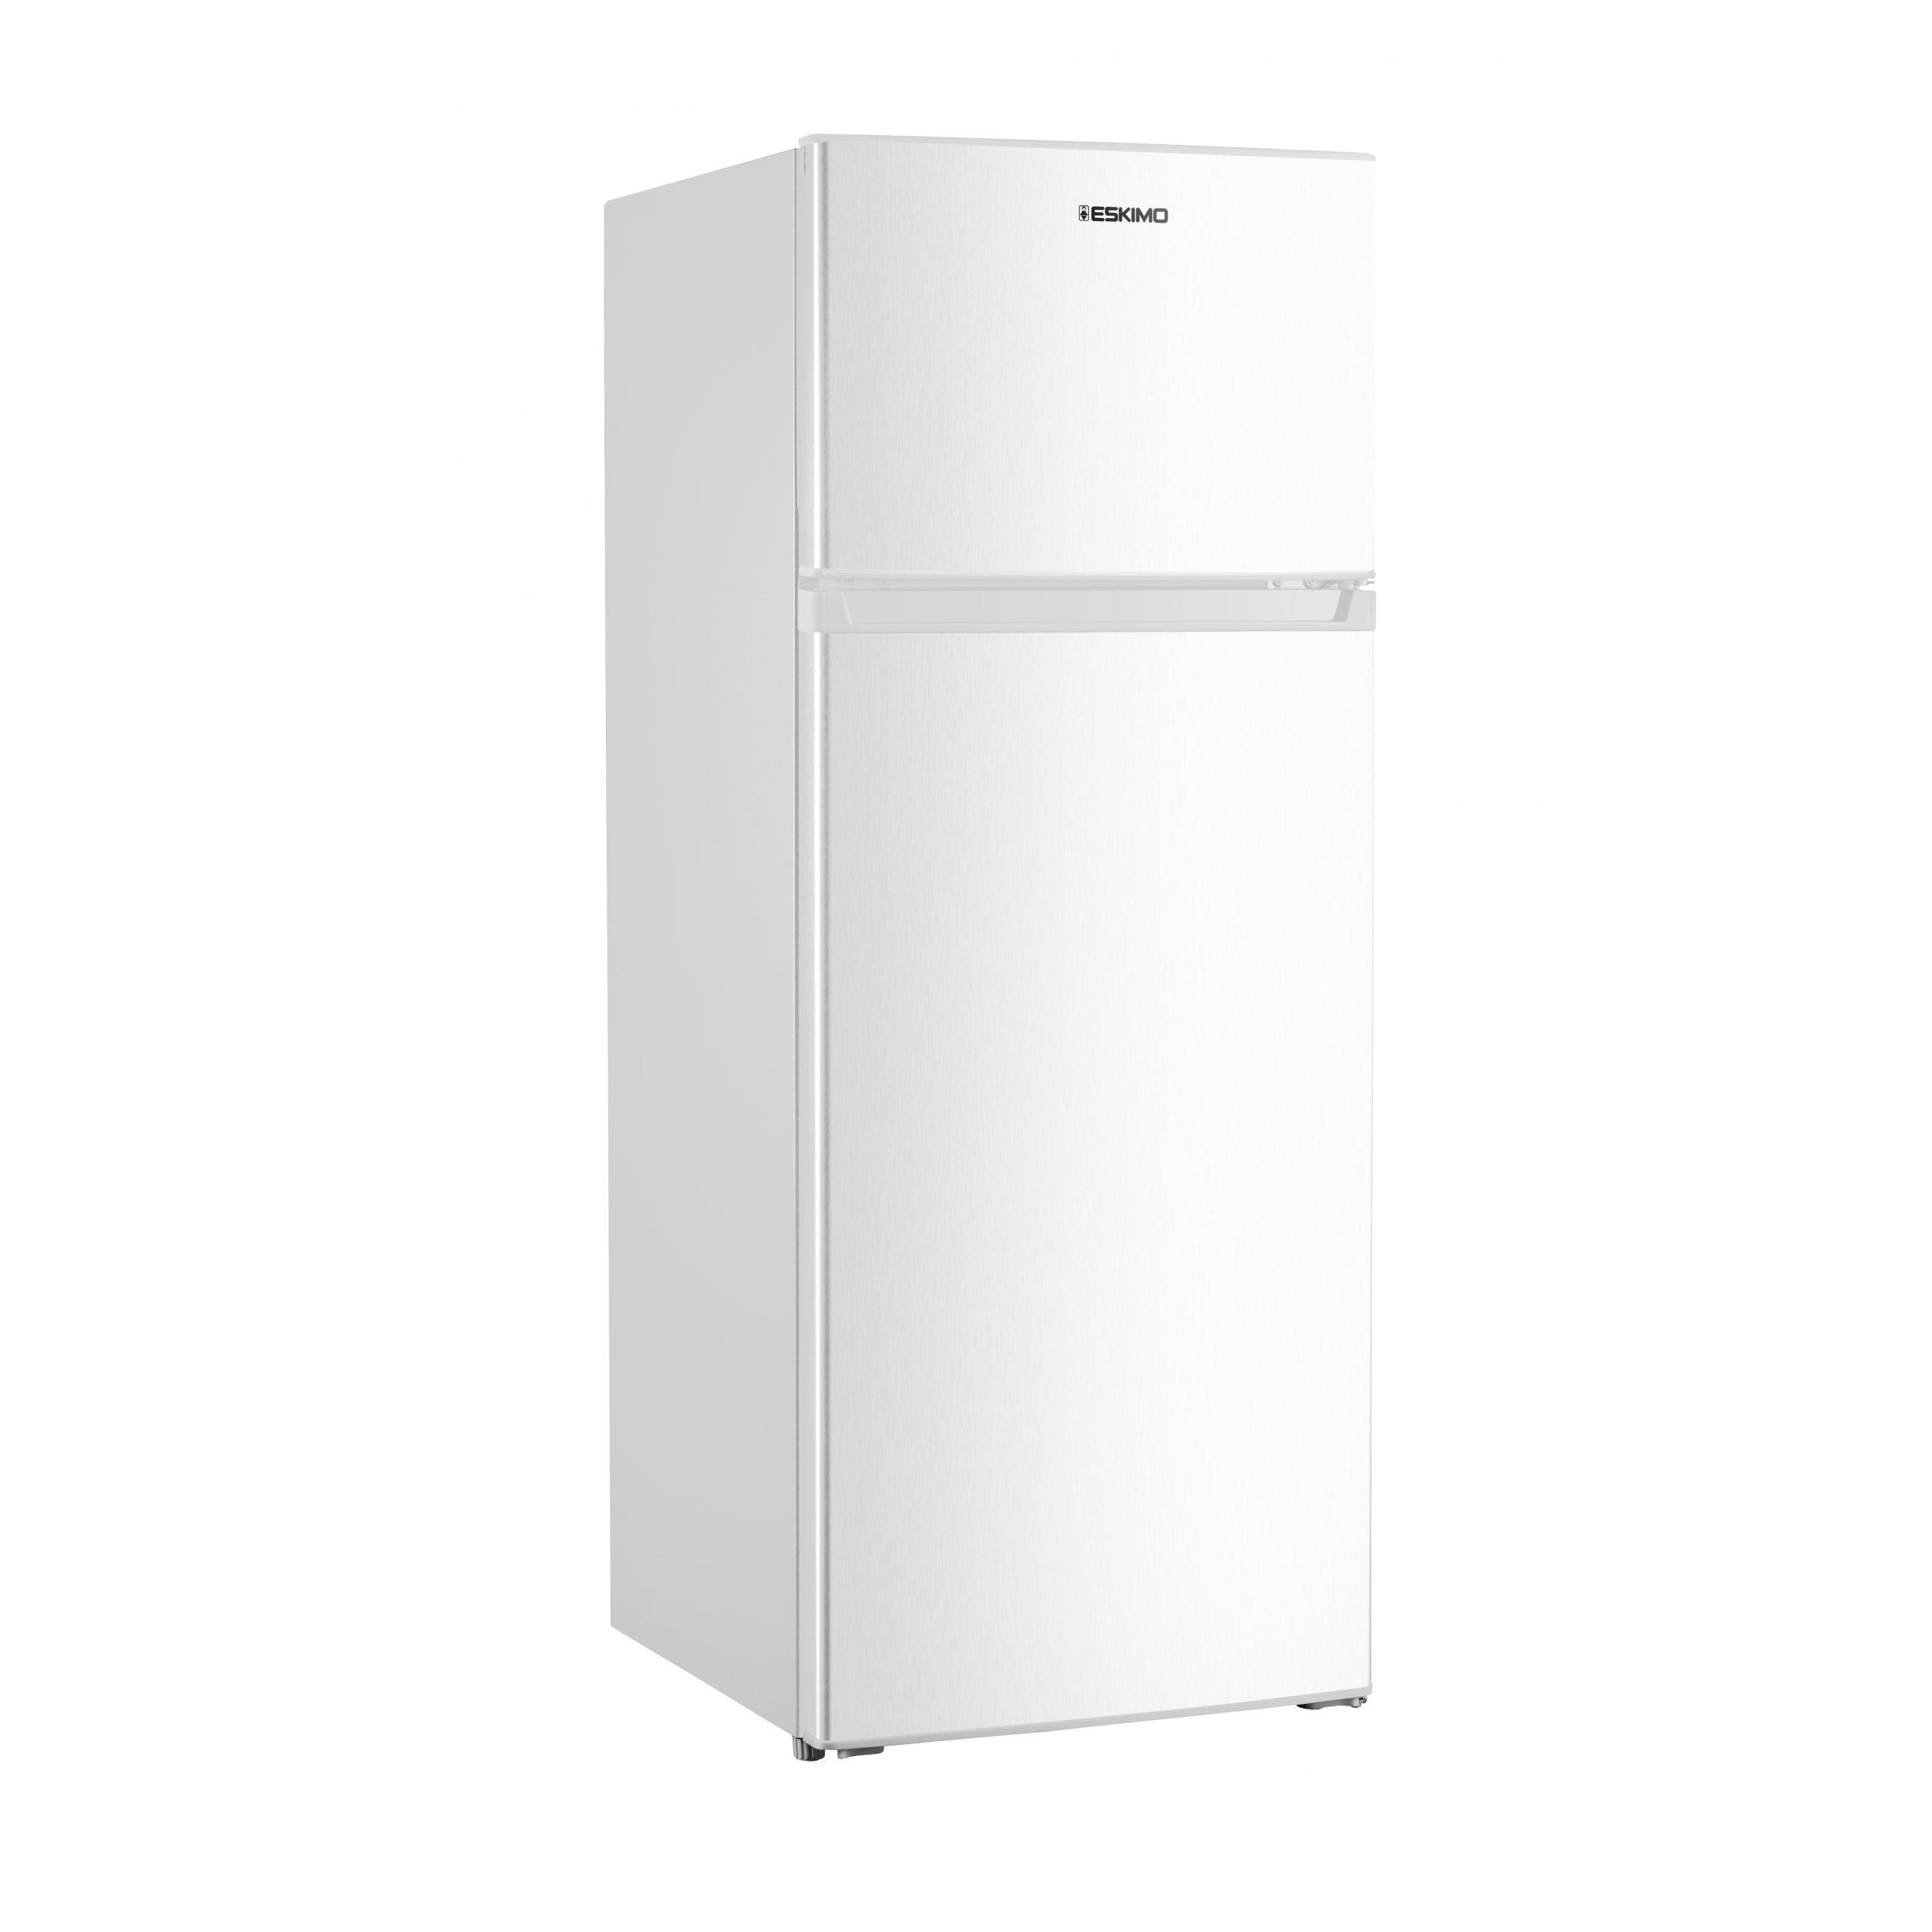 Eskimo Δίπορτο Ψυγείο ES 8197 NF W